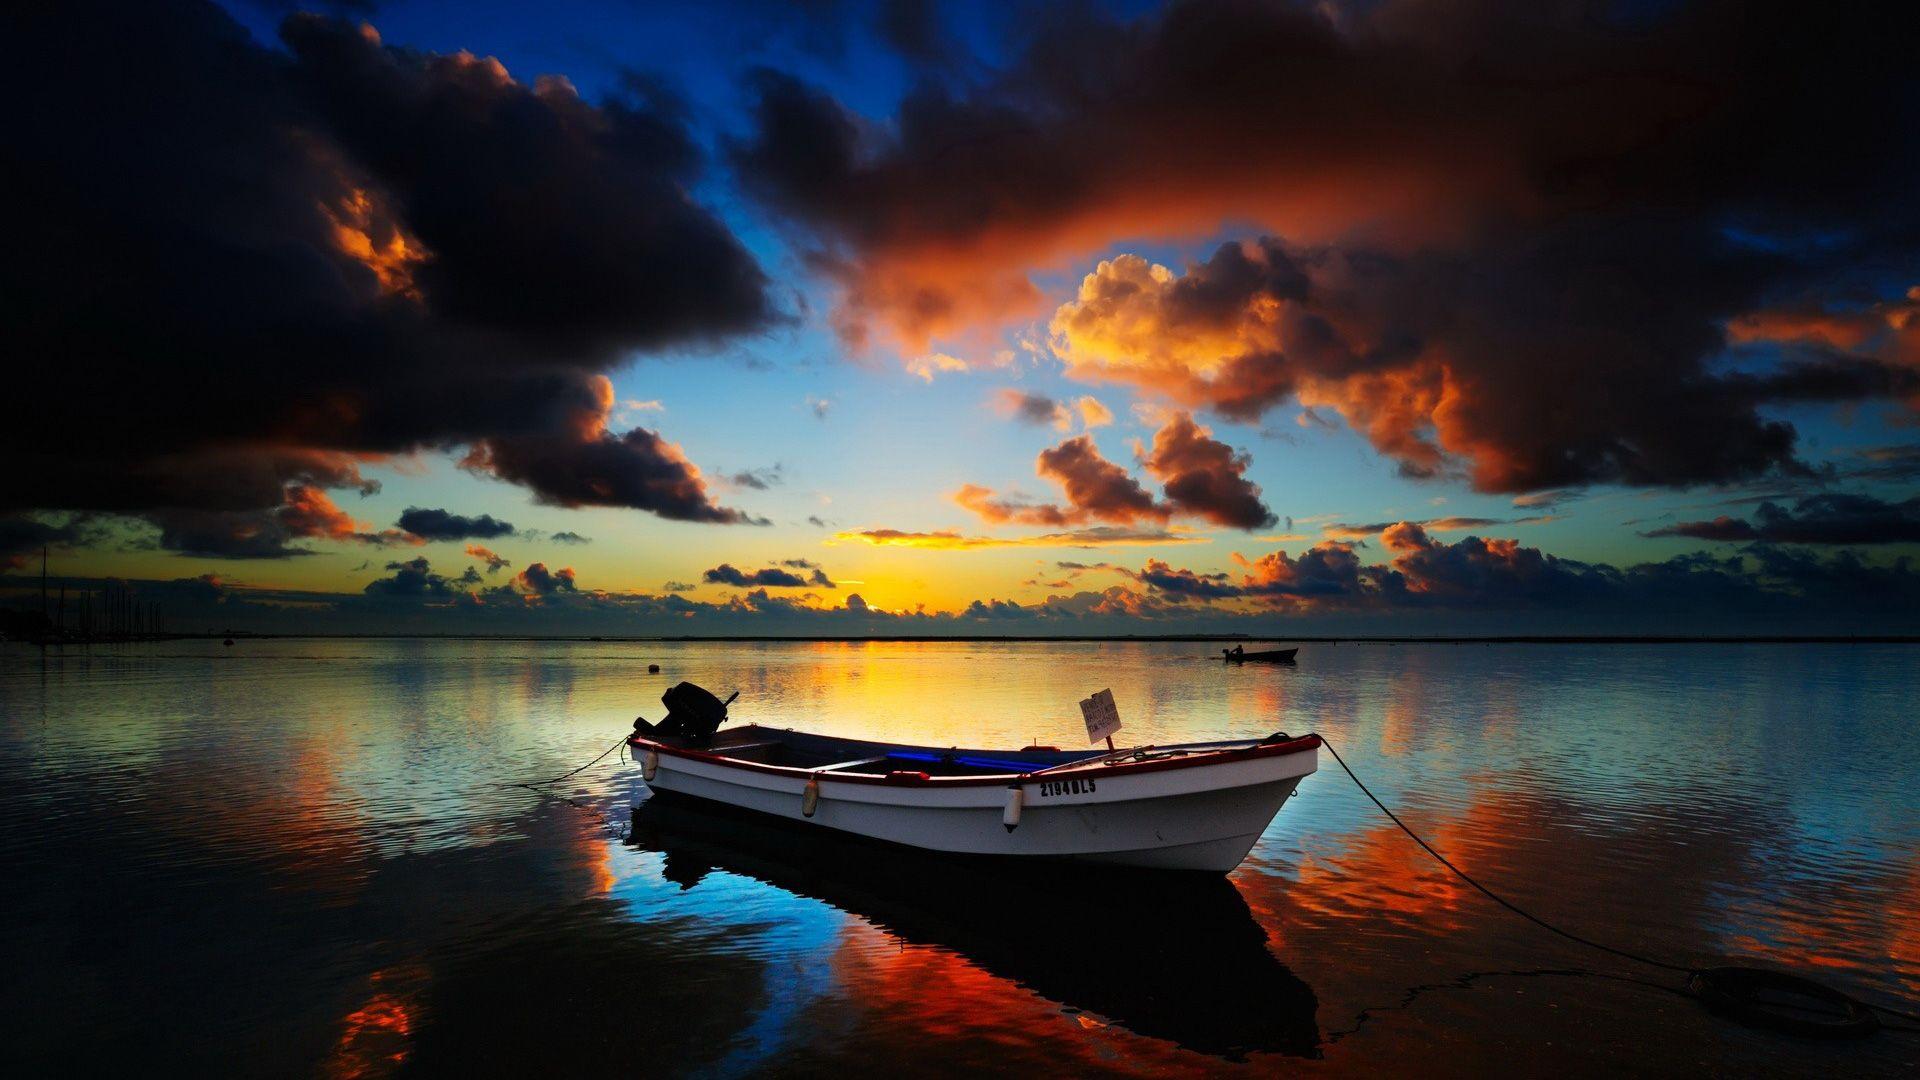 pics of sunrises | dark sunset - 1920x1080 - 16:9 | it was a new day